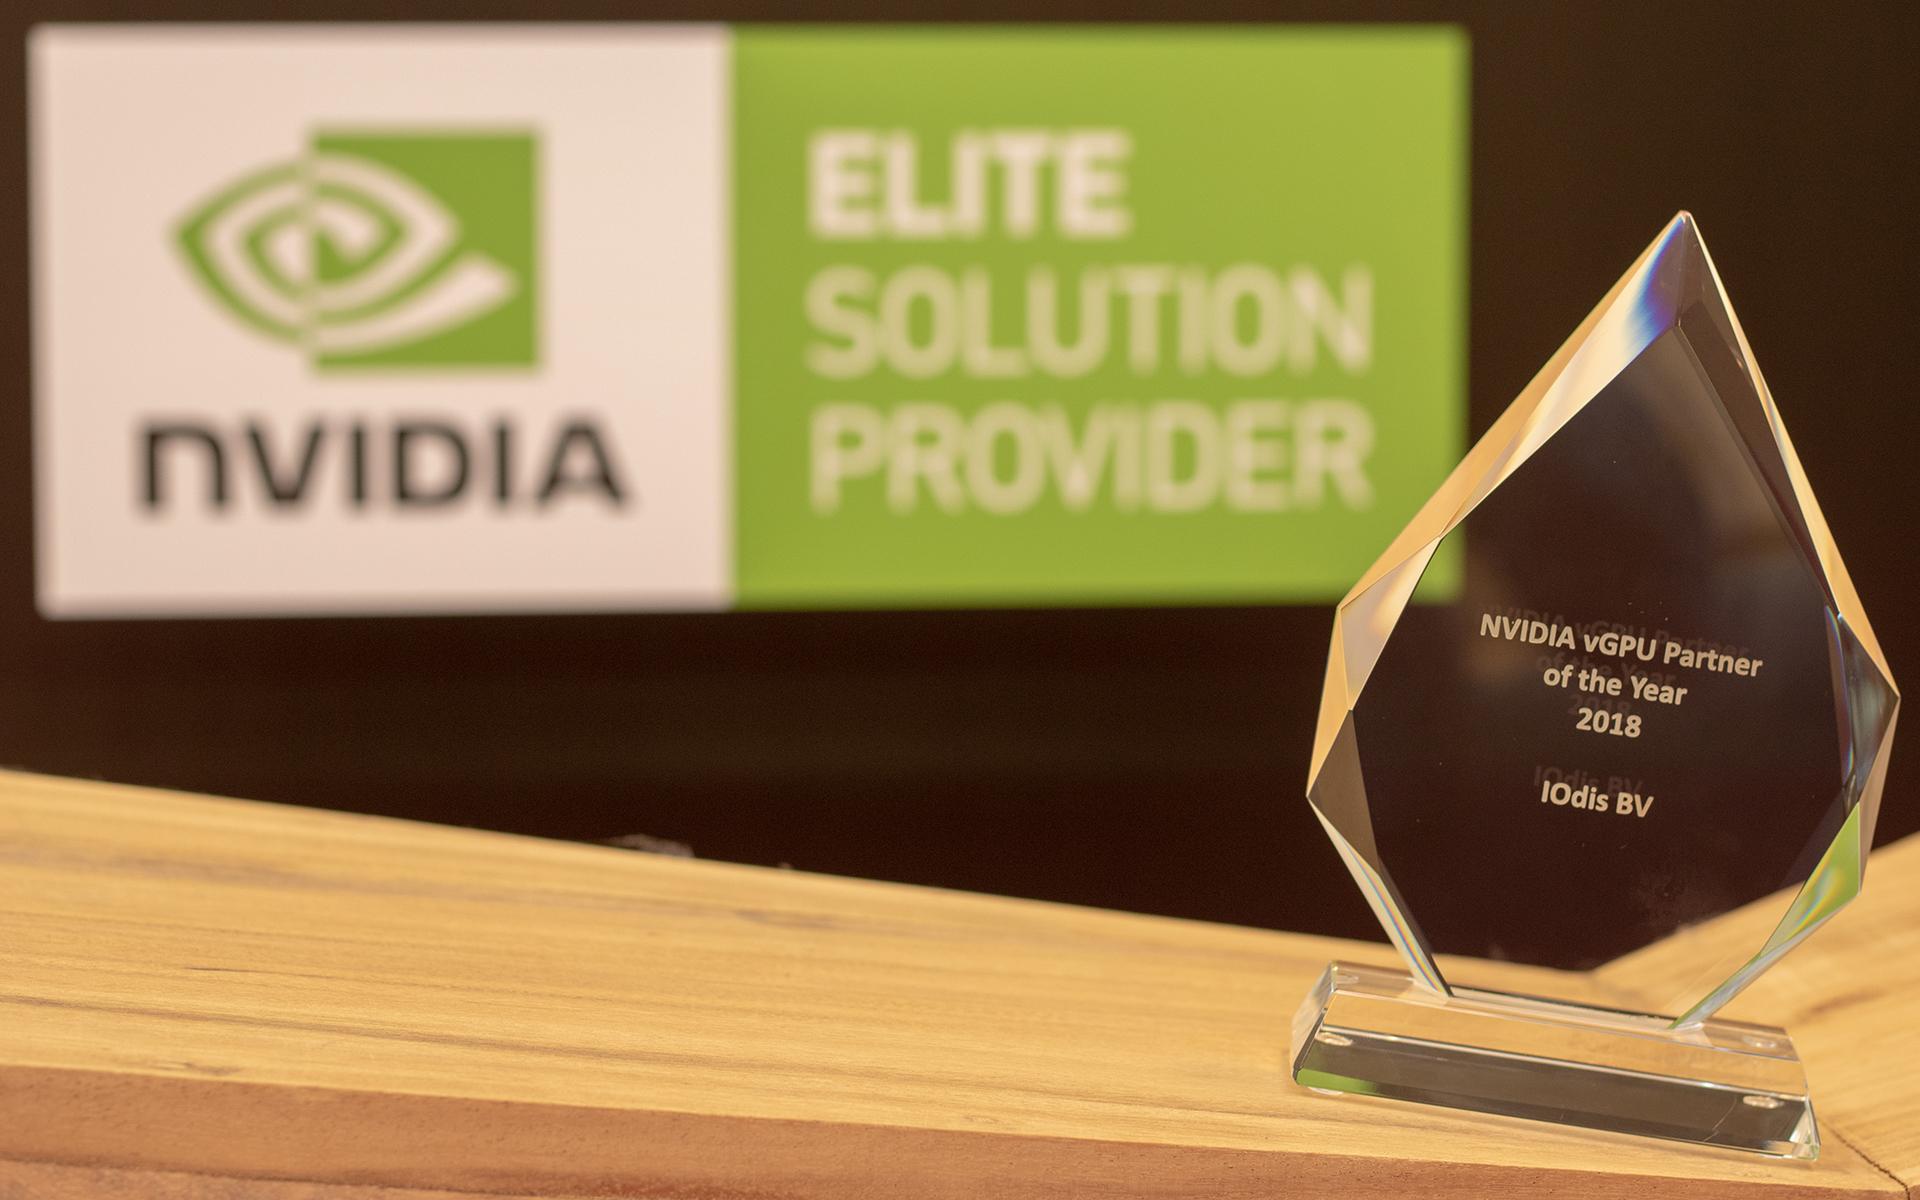 Elite Partner Status & vGPU EMEA Award